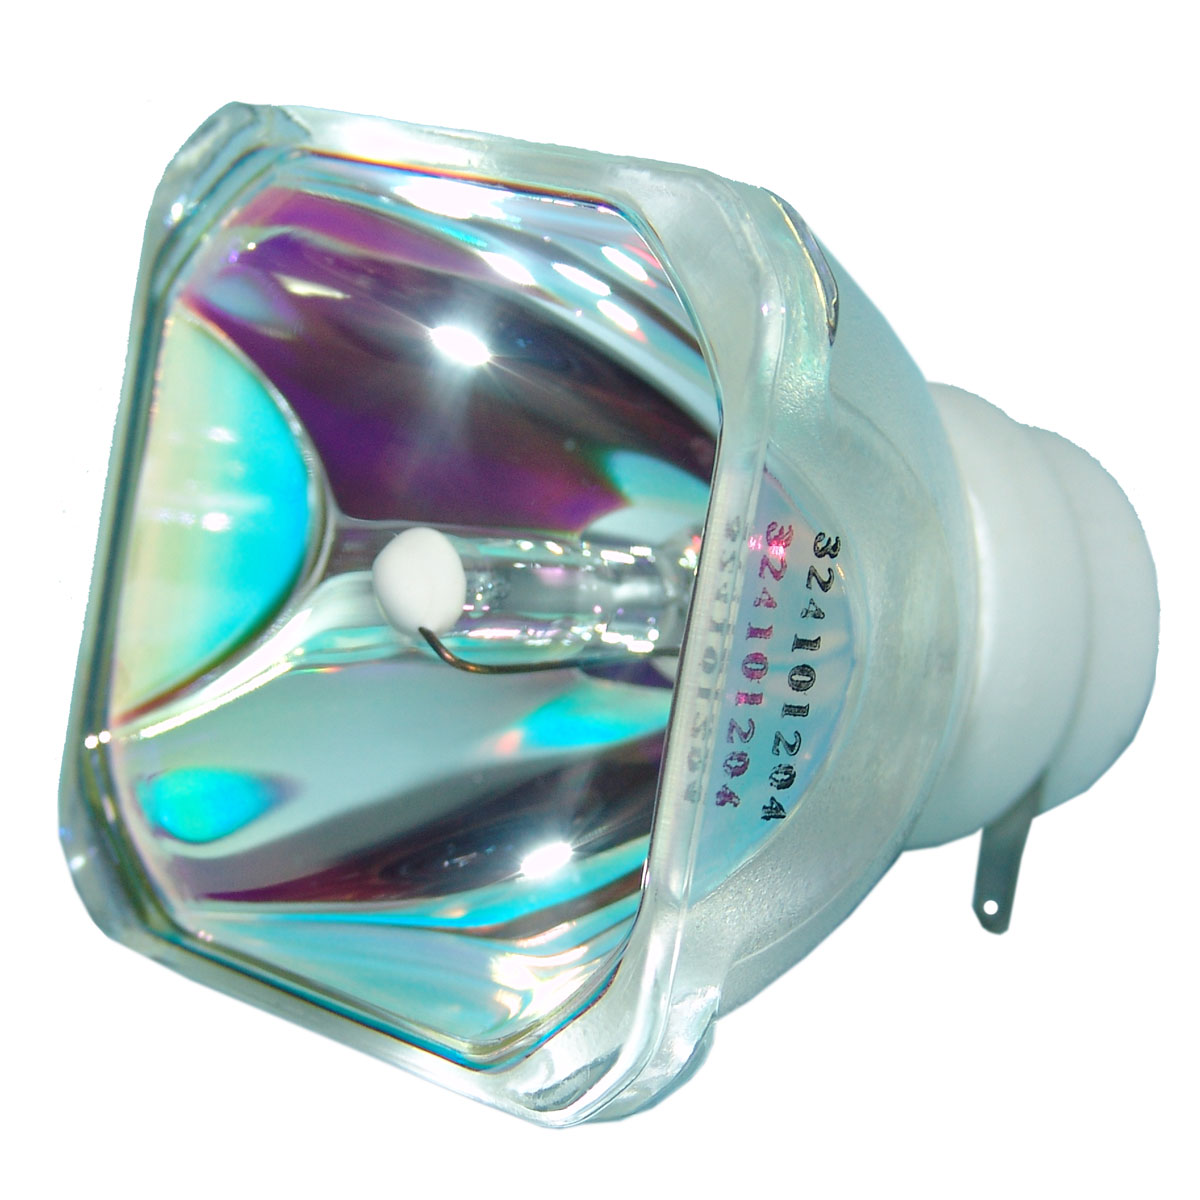 Lutema Platinum for Christie 003-120730-01 Projector Lamp with Housing (Original Philips Bulb Inside) - image 5 de 5